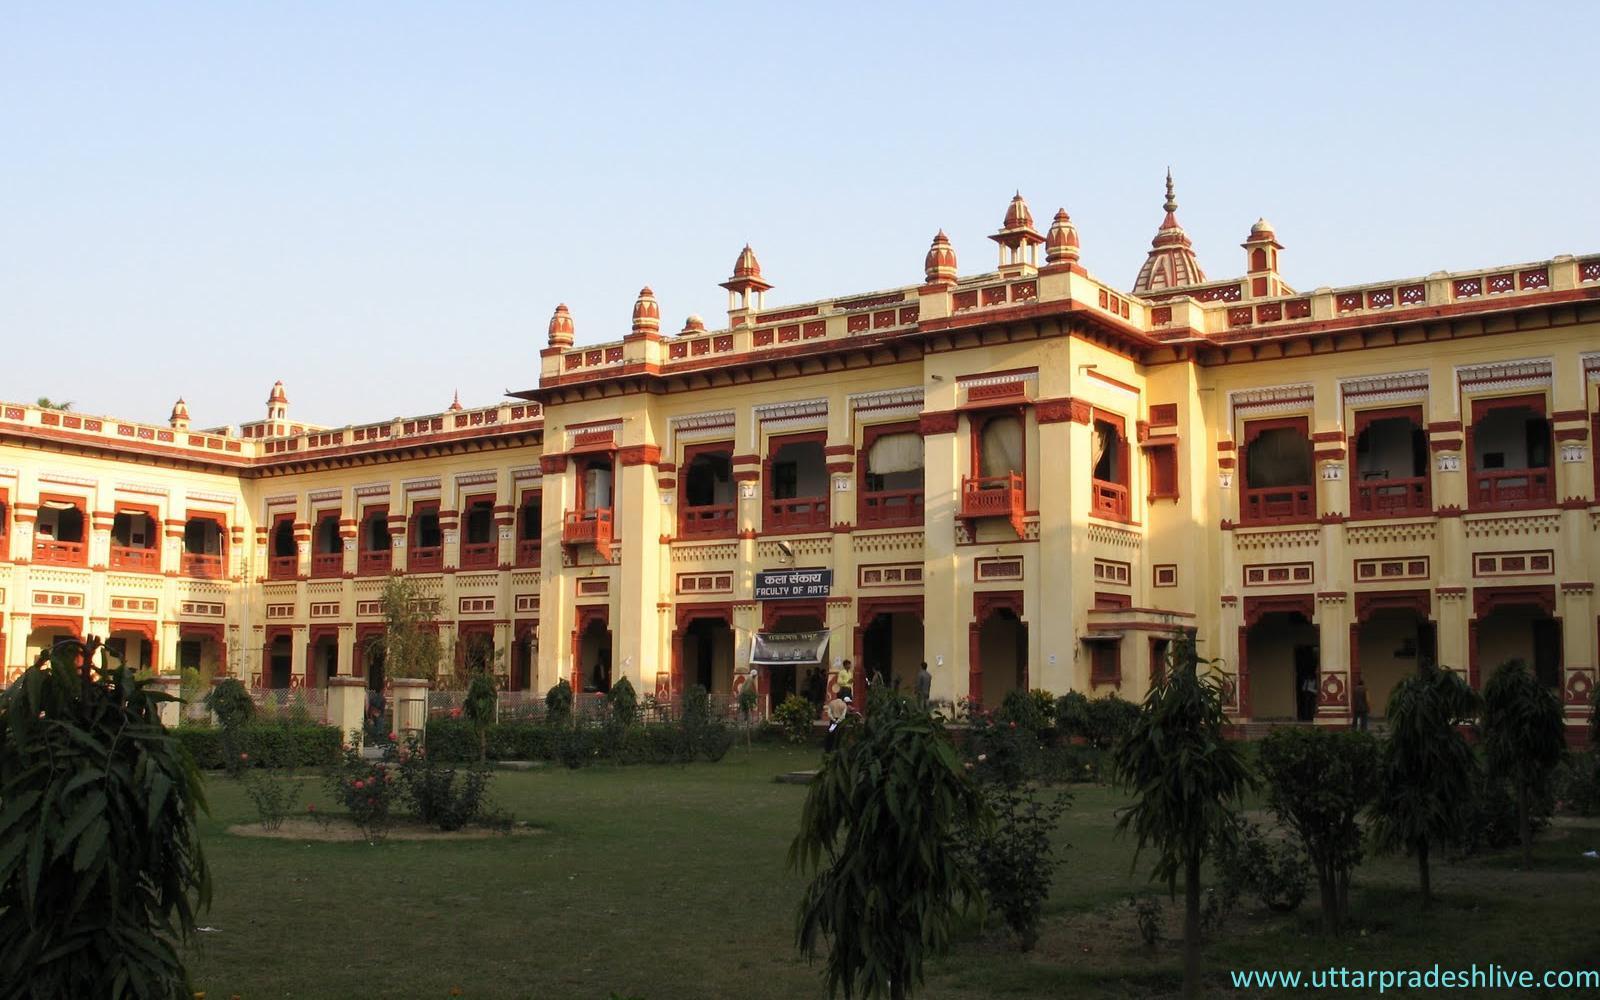 http://3.bp.blogspot.com/-kdH5lxkSH90/TkeAk7Oww1I/AAAAAAAAErA/I3HY4jrY0pE/s1600/Banaras_Hindu_University-BHU.jpg